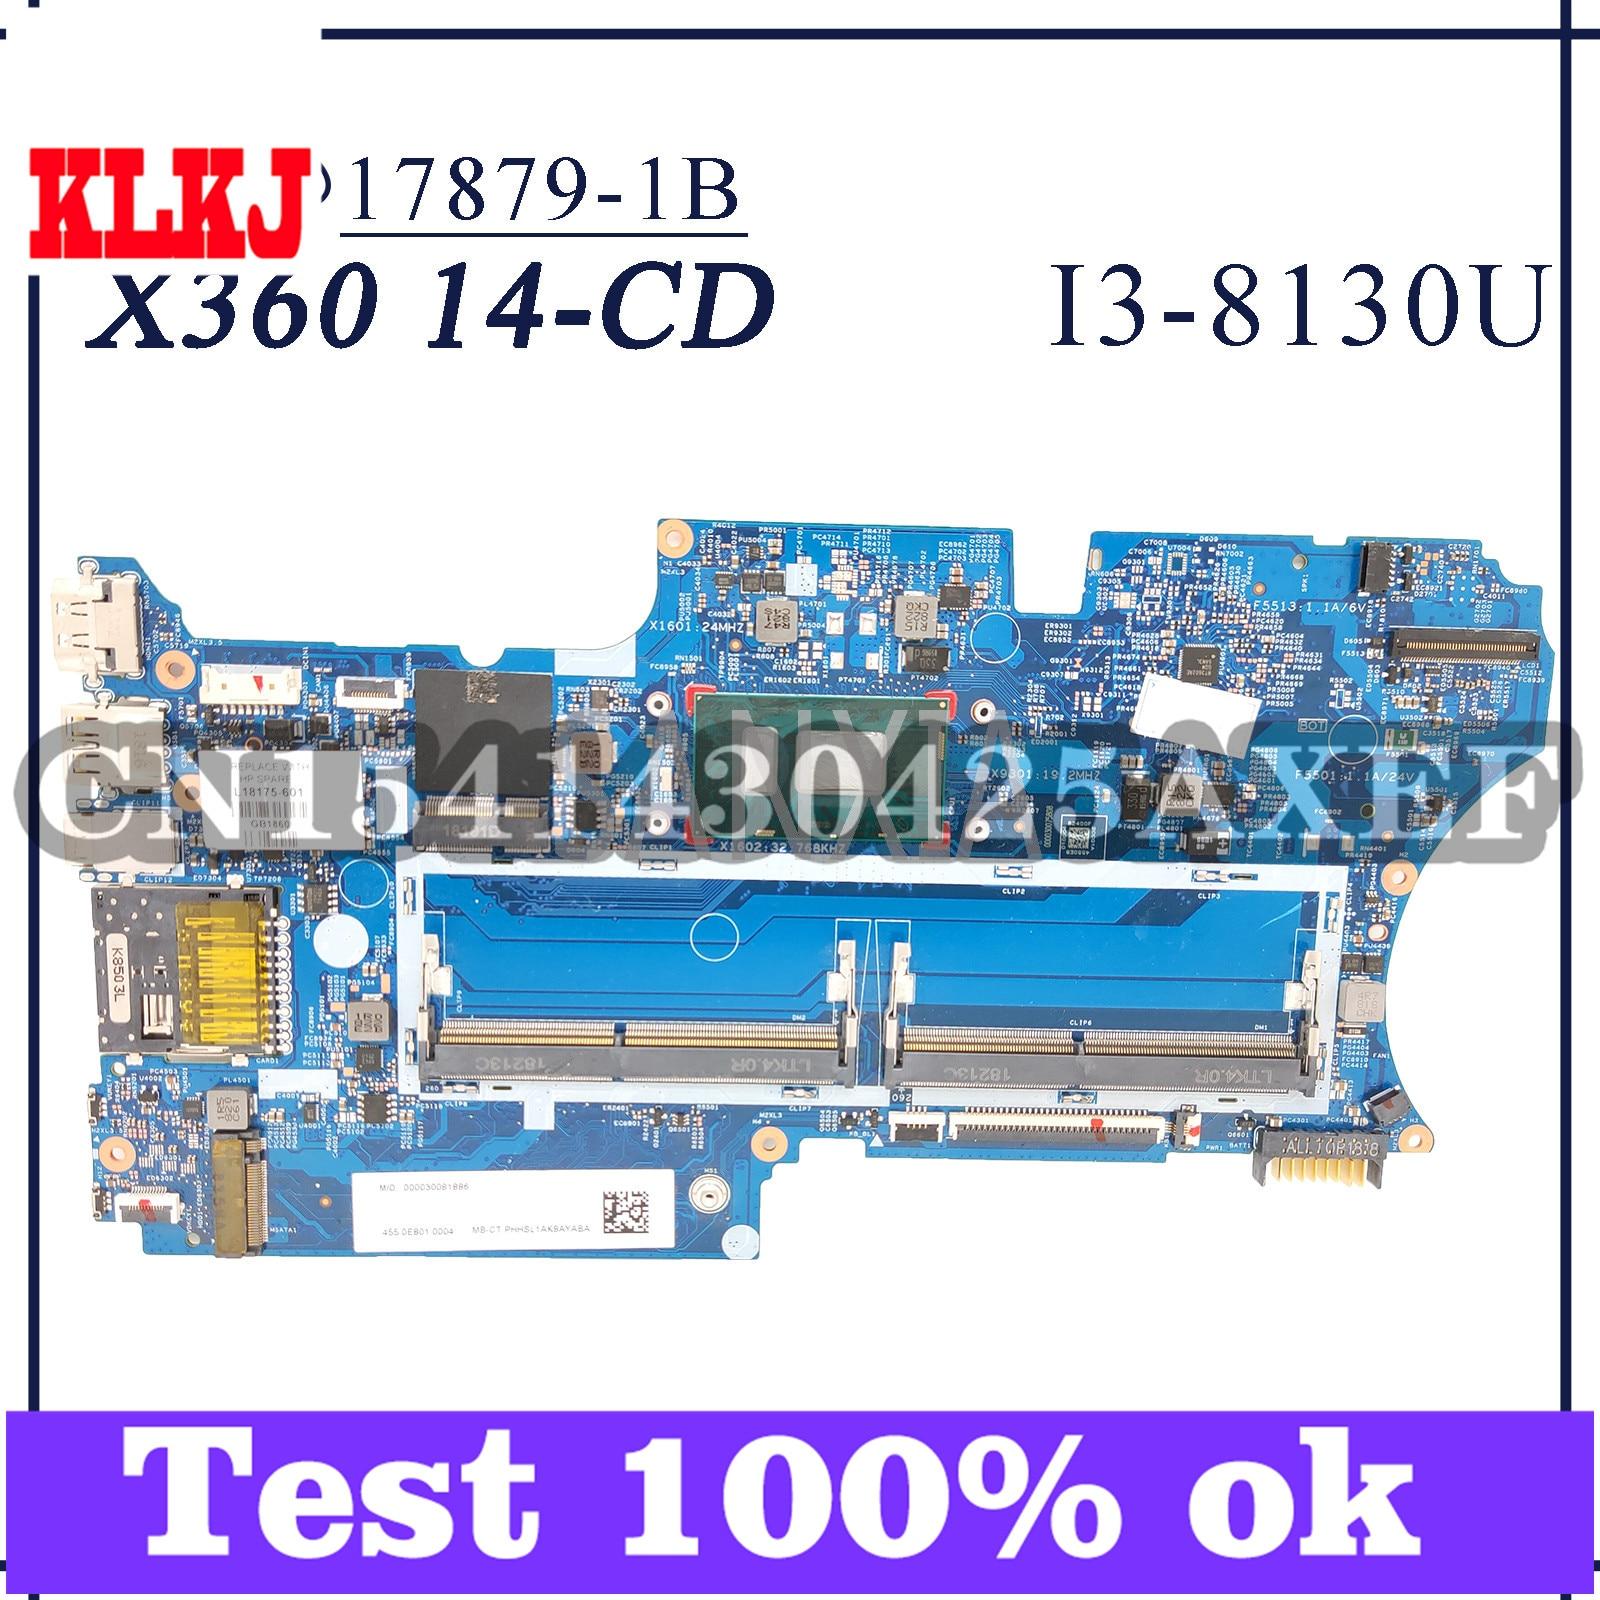 KLKJ 17879-1B اللوحة الأم لأجهزة الكمبيوتر المحمول HP بافيليون X360 14-CD اللوحة الرئيسية الأصلية I3-8130U وحدة المعالجة المركزية GM L18163-601 L18163-001